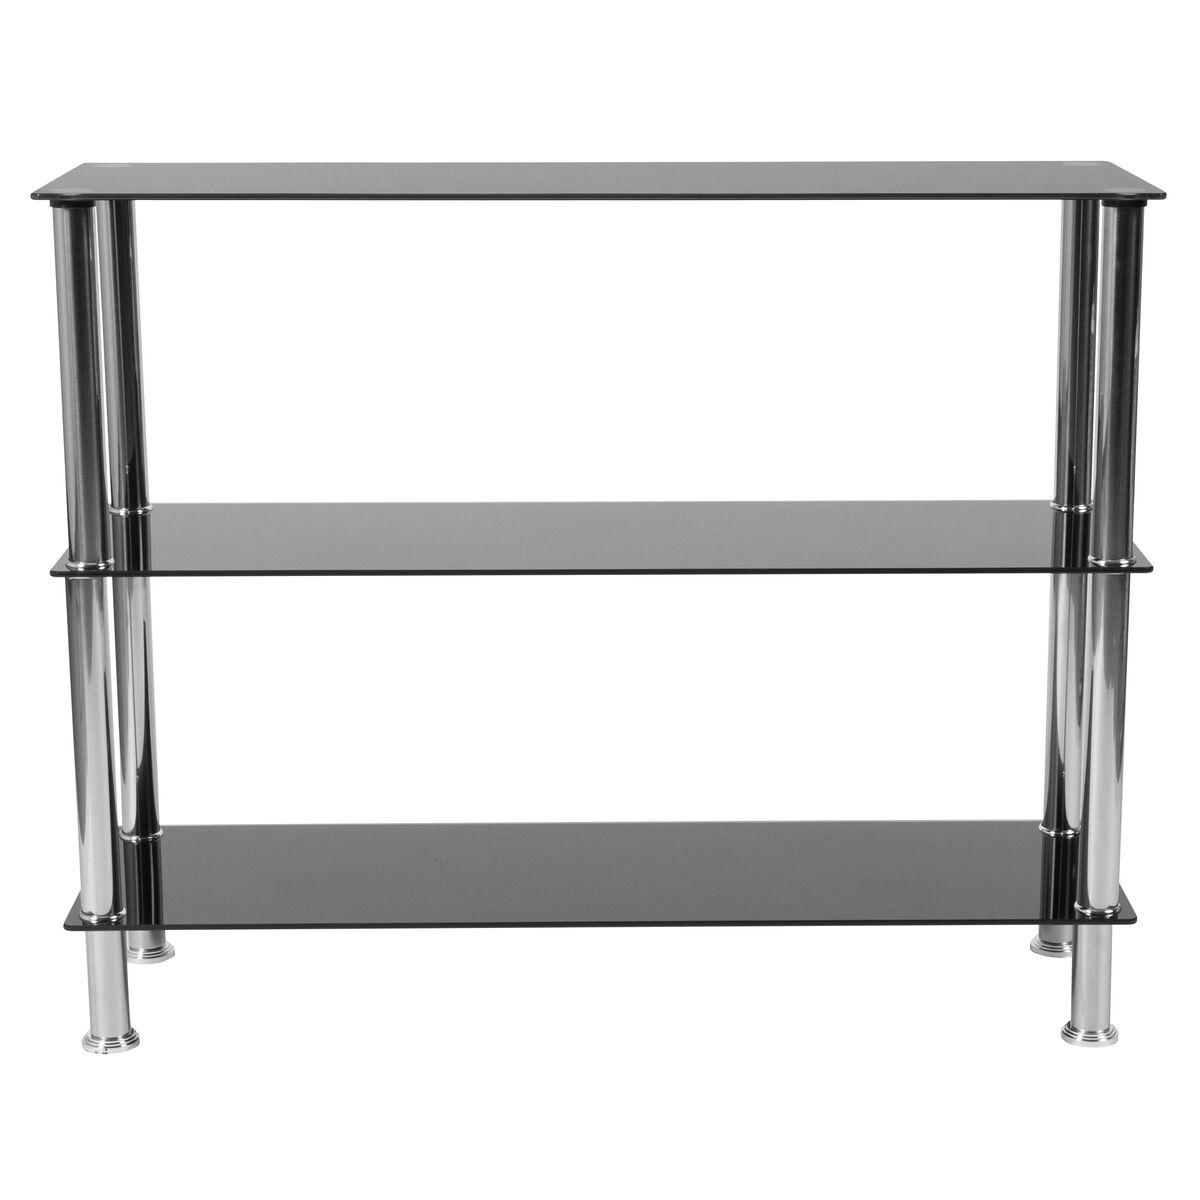 Black Glass Storage Shelf HG-112354-GG | Bizchair.com